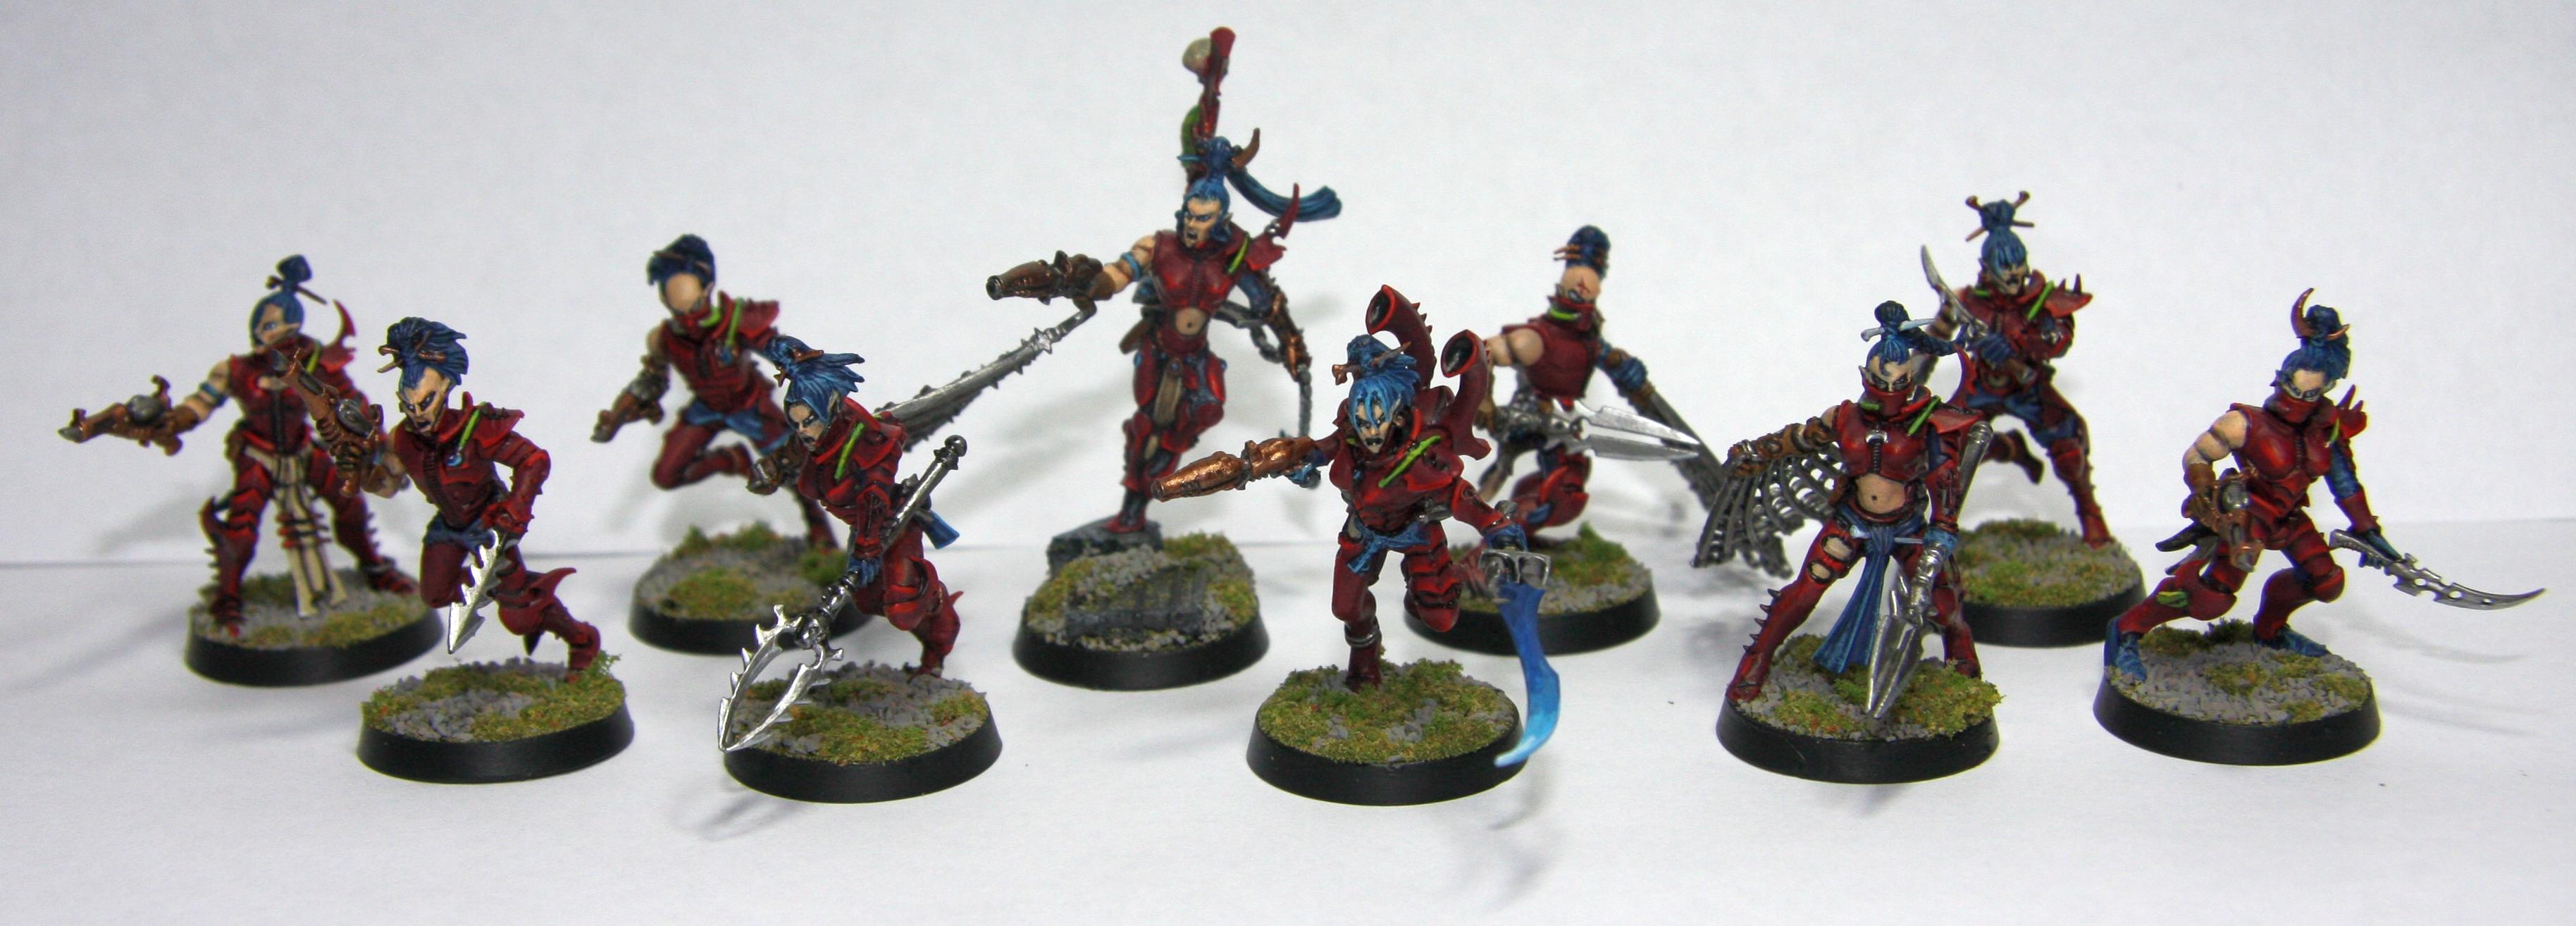 Bloodbrides, Dark Eldar, Succubus